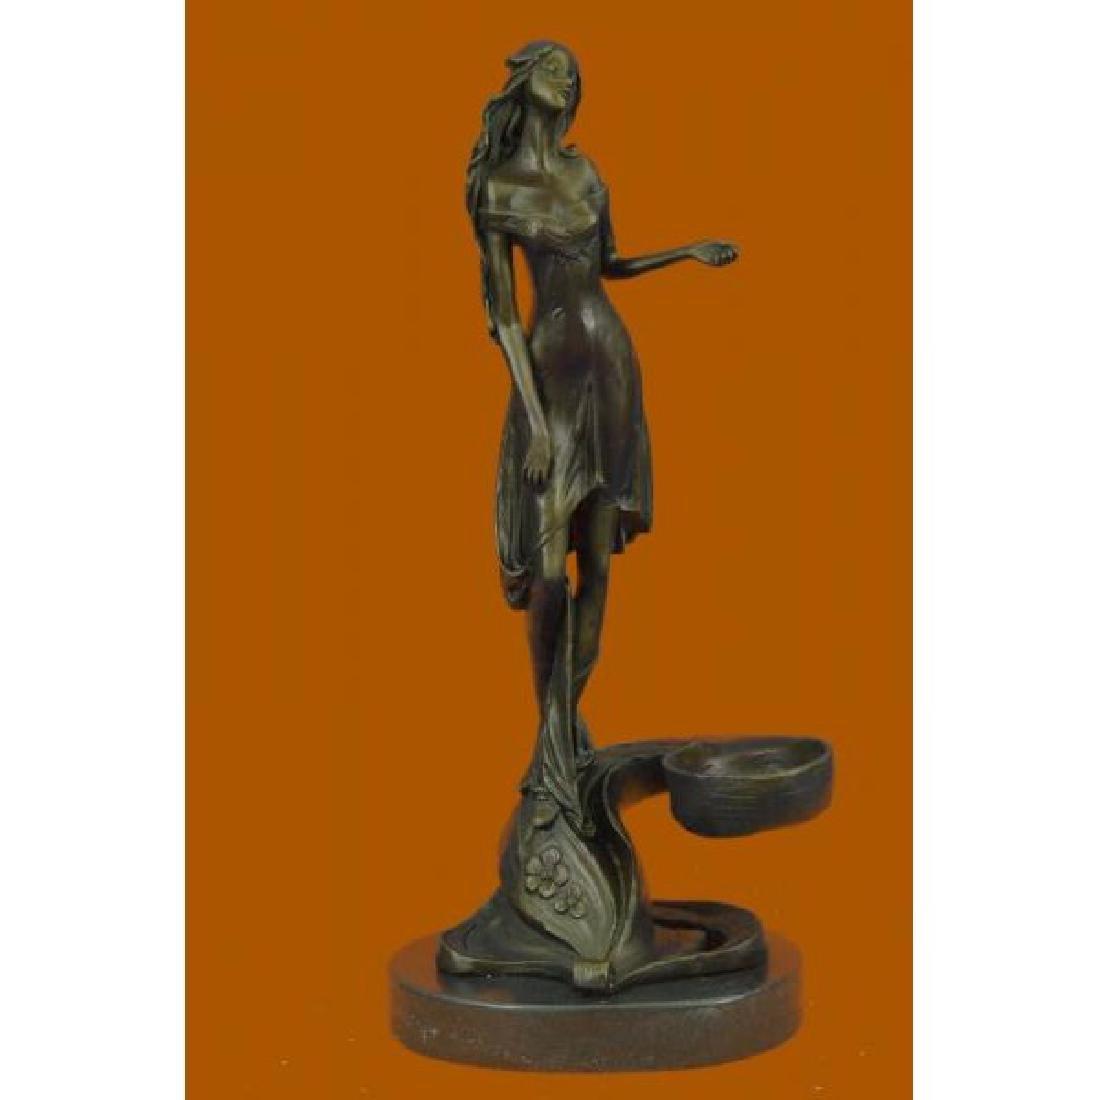 Art Nouveau Young Maiden Bronze Sculpture Figurine